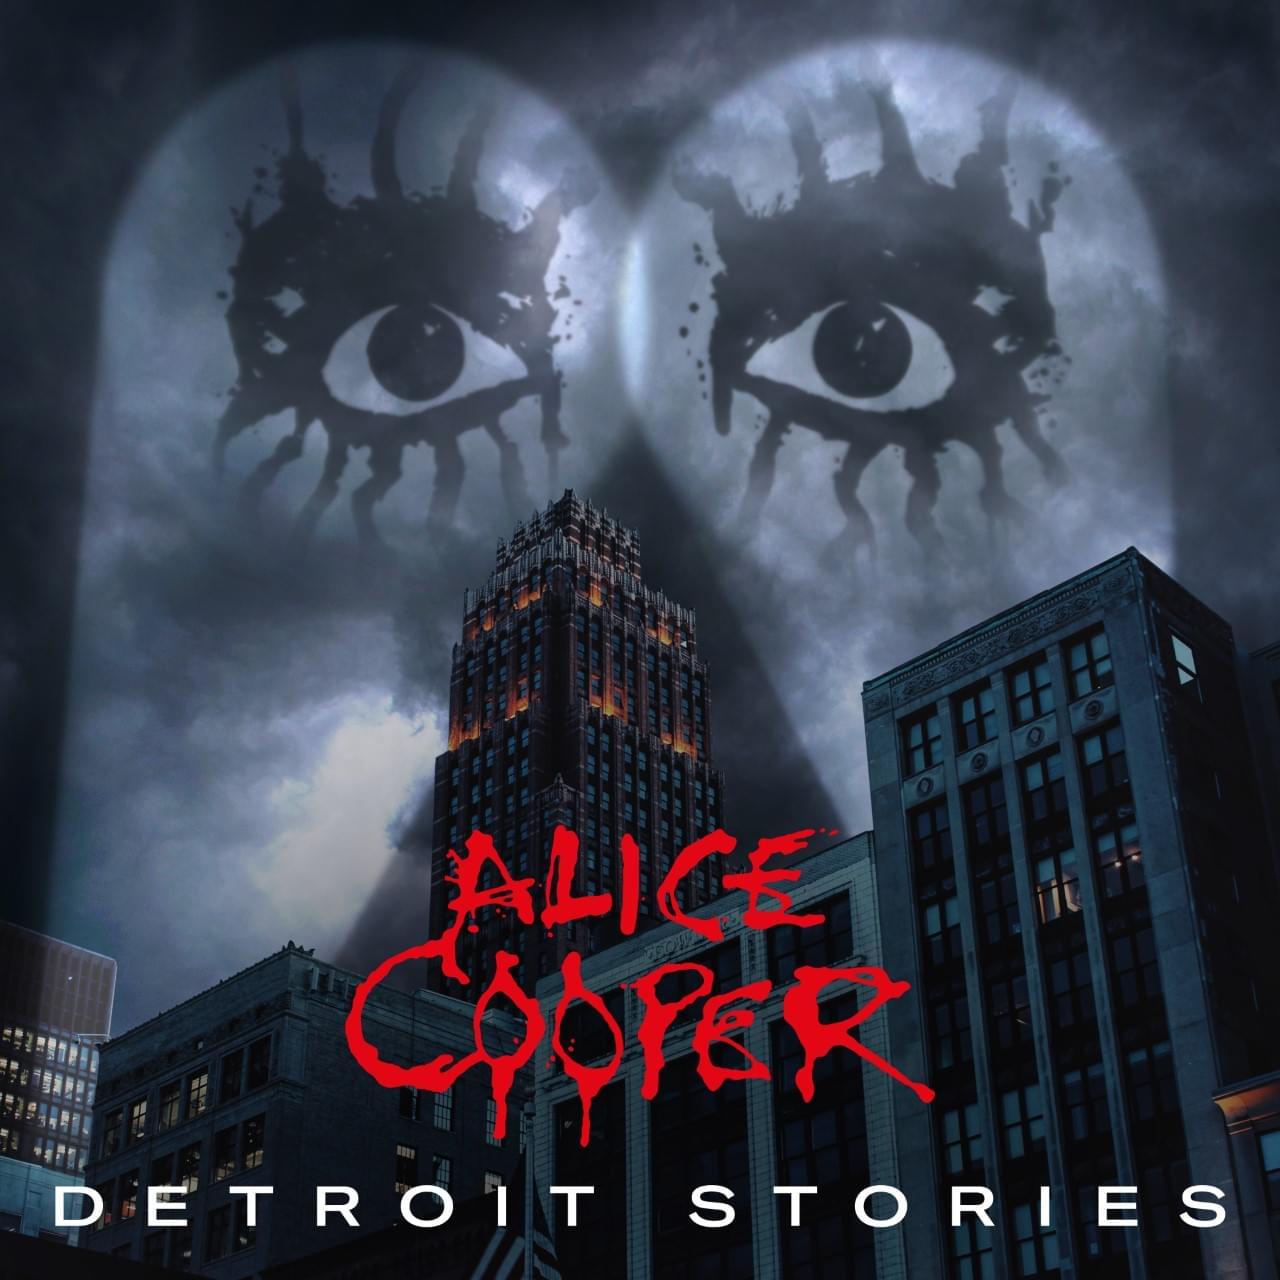 INTERVIEW: ALICE COOPER